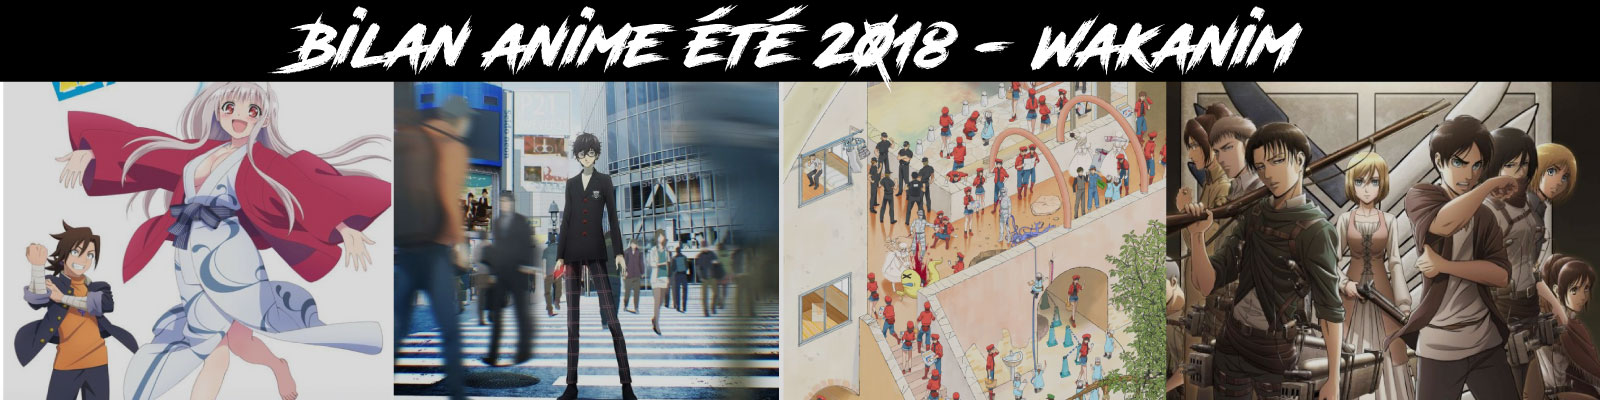 Bilan anime été 2018 - Wakanim